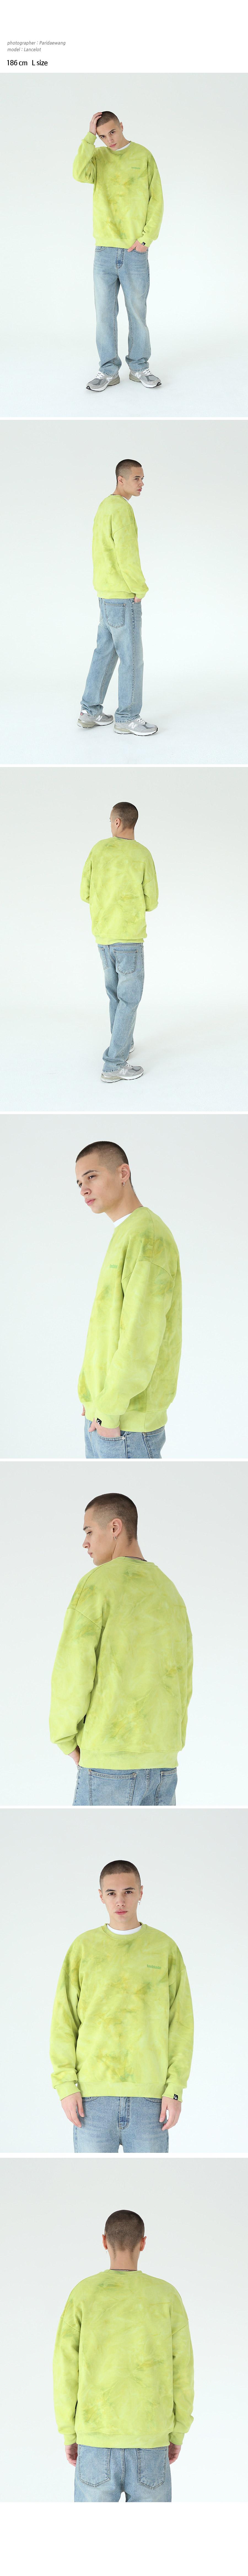 tai270mm-yellow-green-02.jpg